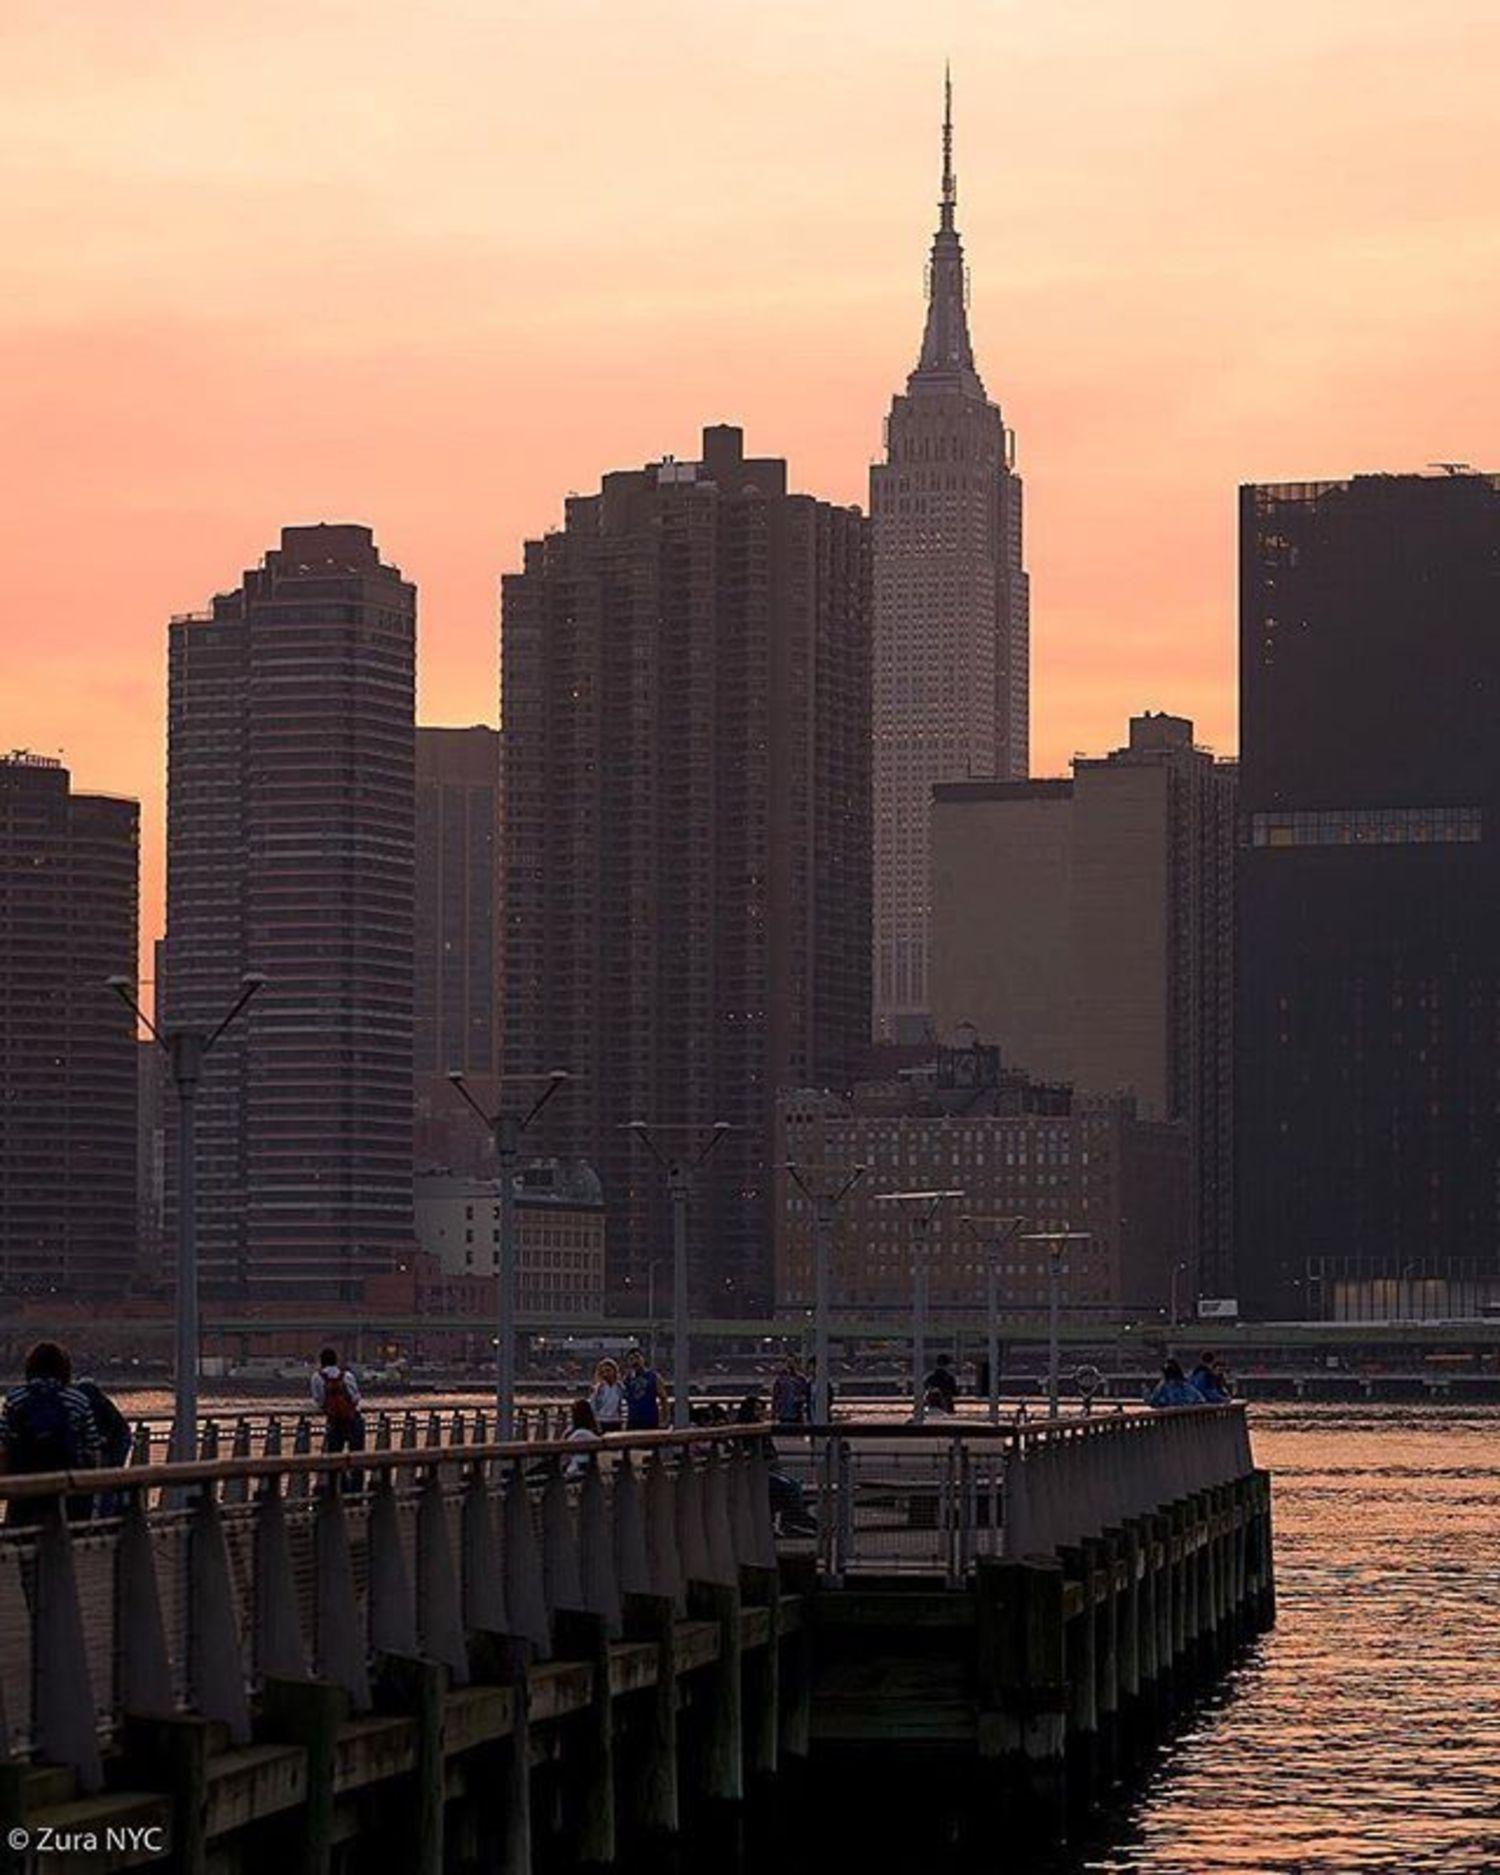 New York, New York. Photo via @zura.nyc #viewingnyc #newyork #newyorkcity #sunset #empirestatebuilding